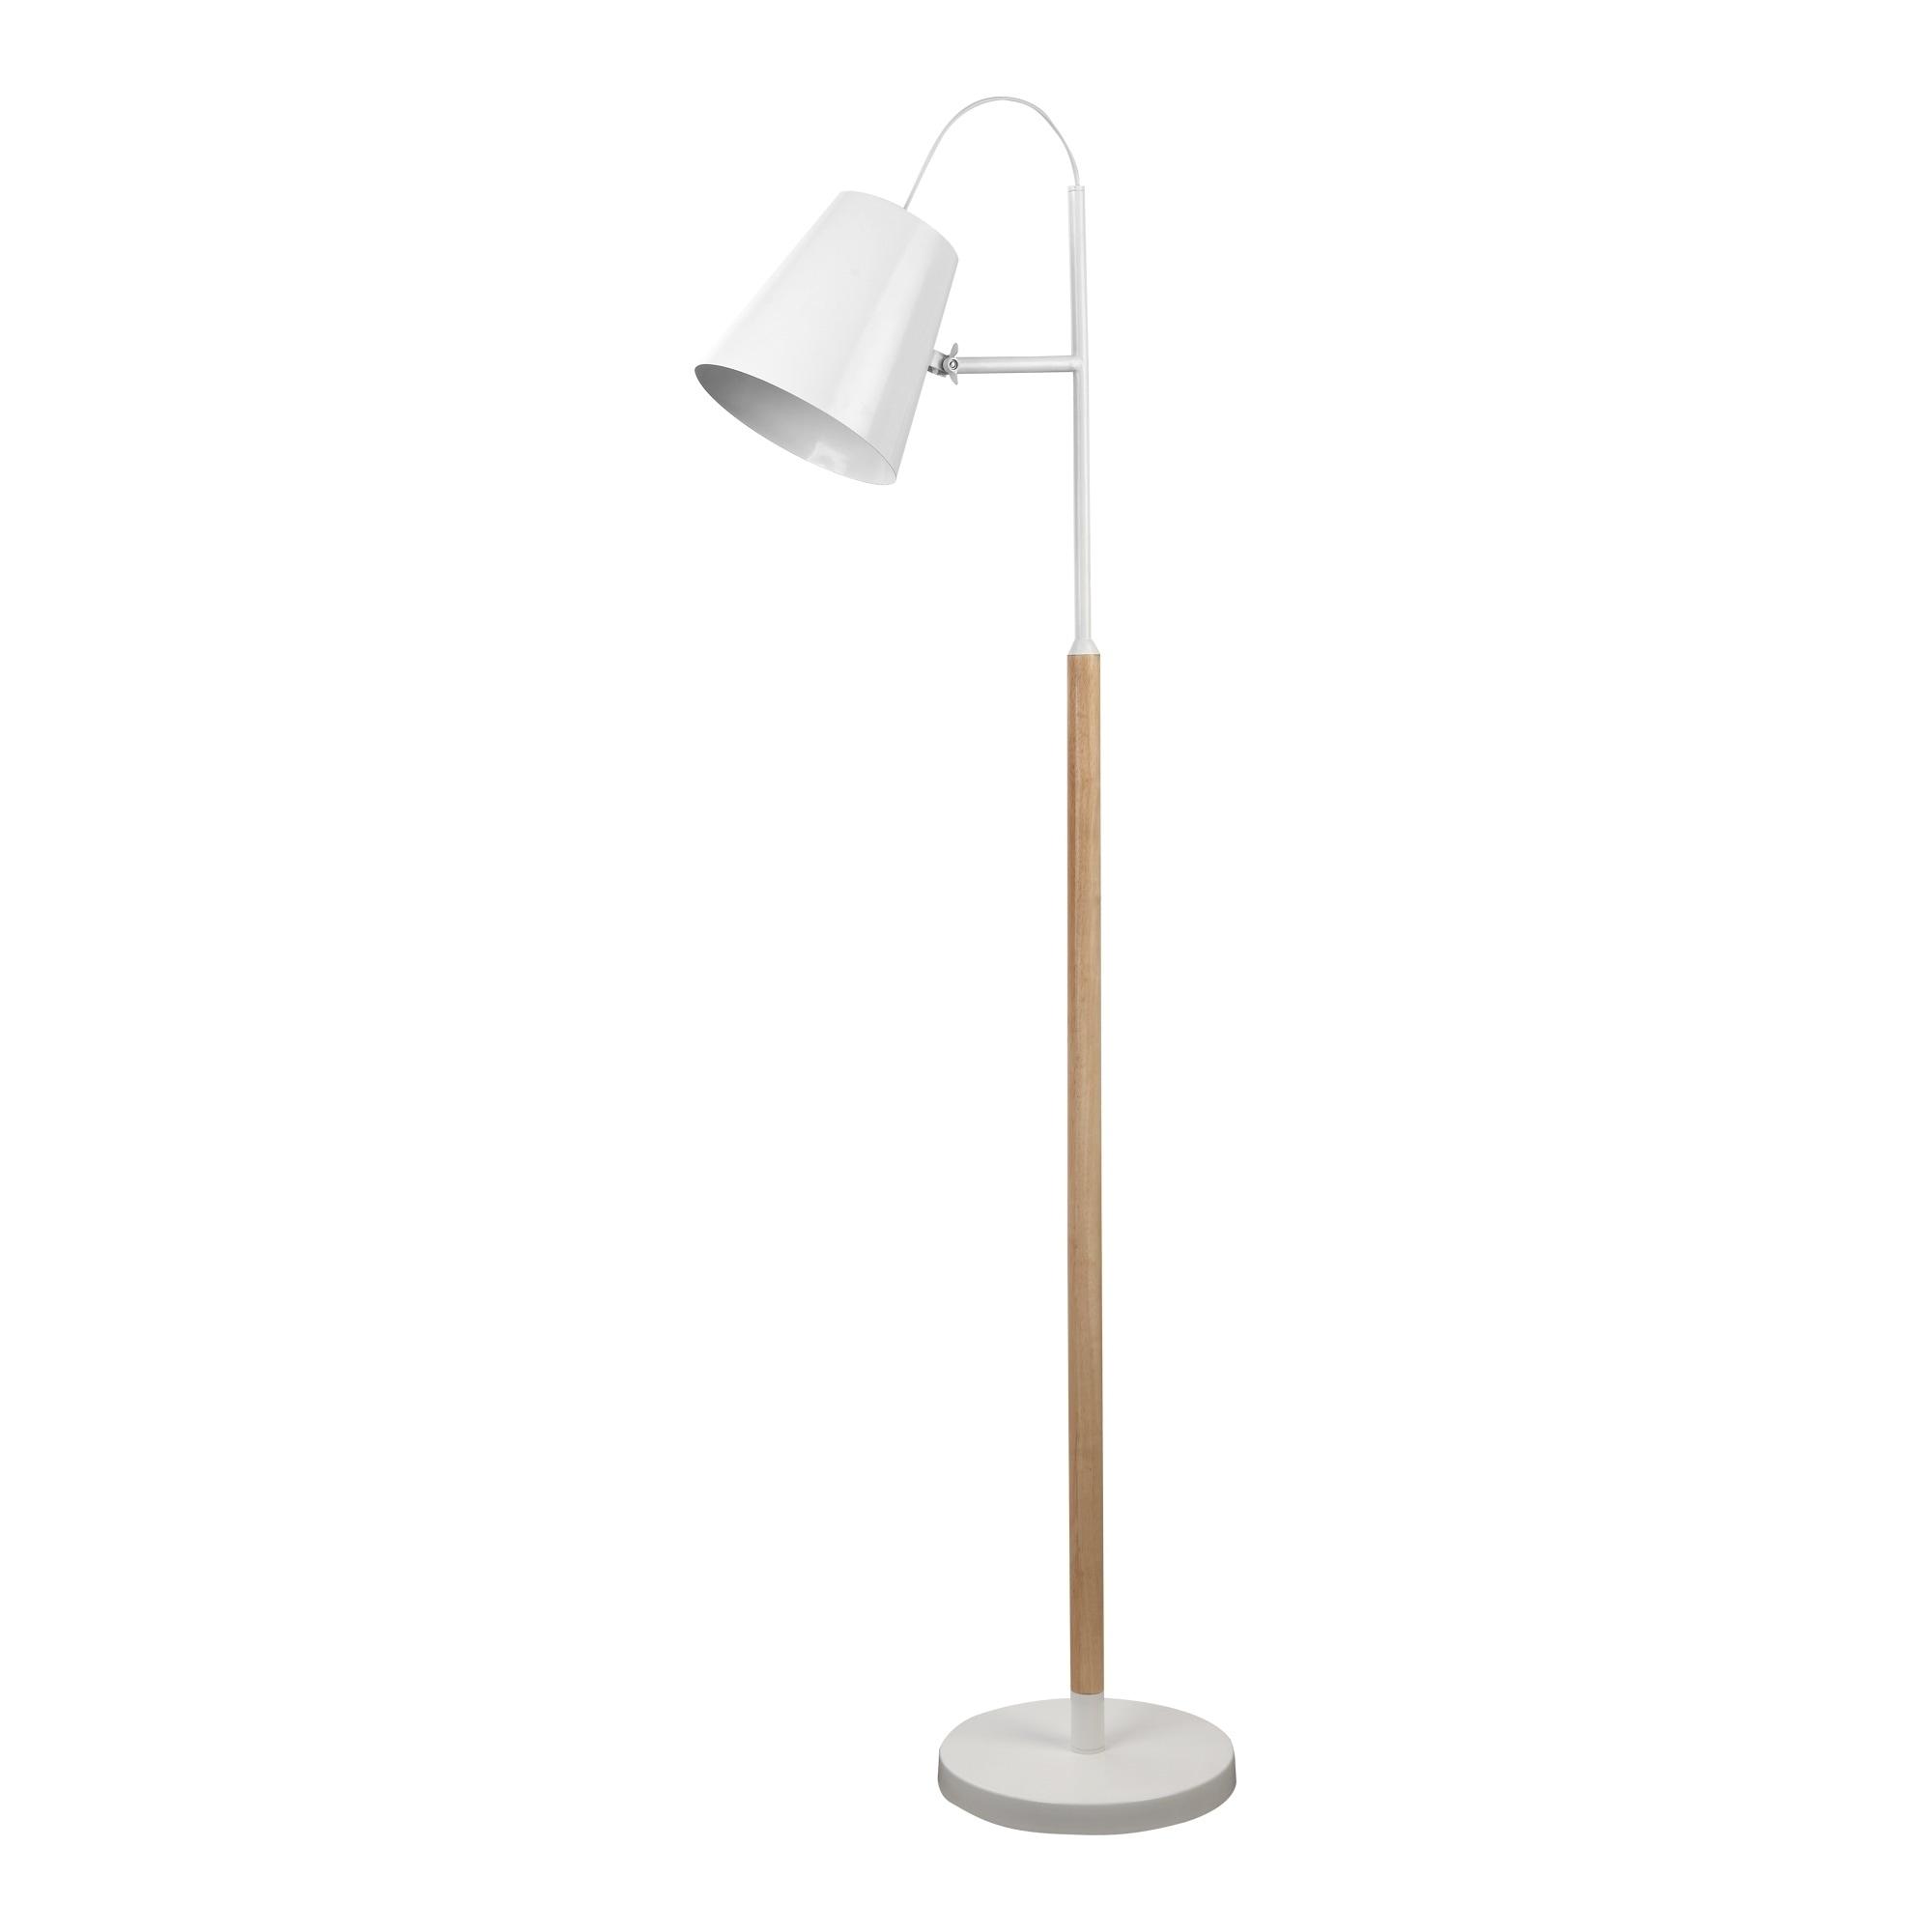 Aurelle Home Mid Century Floor Lamp